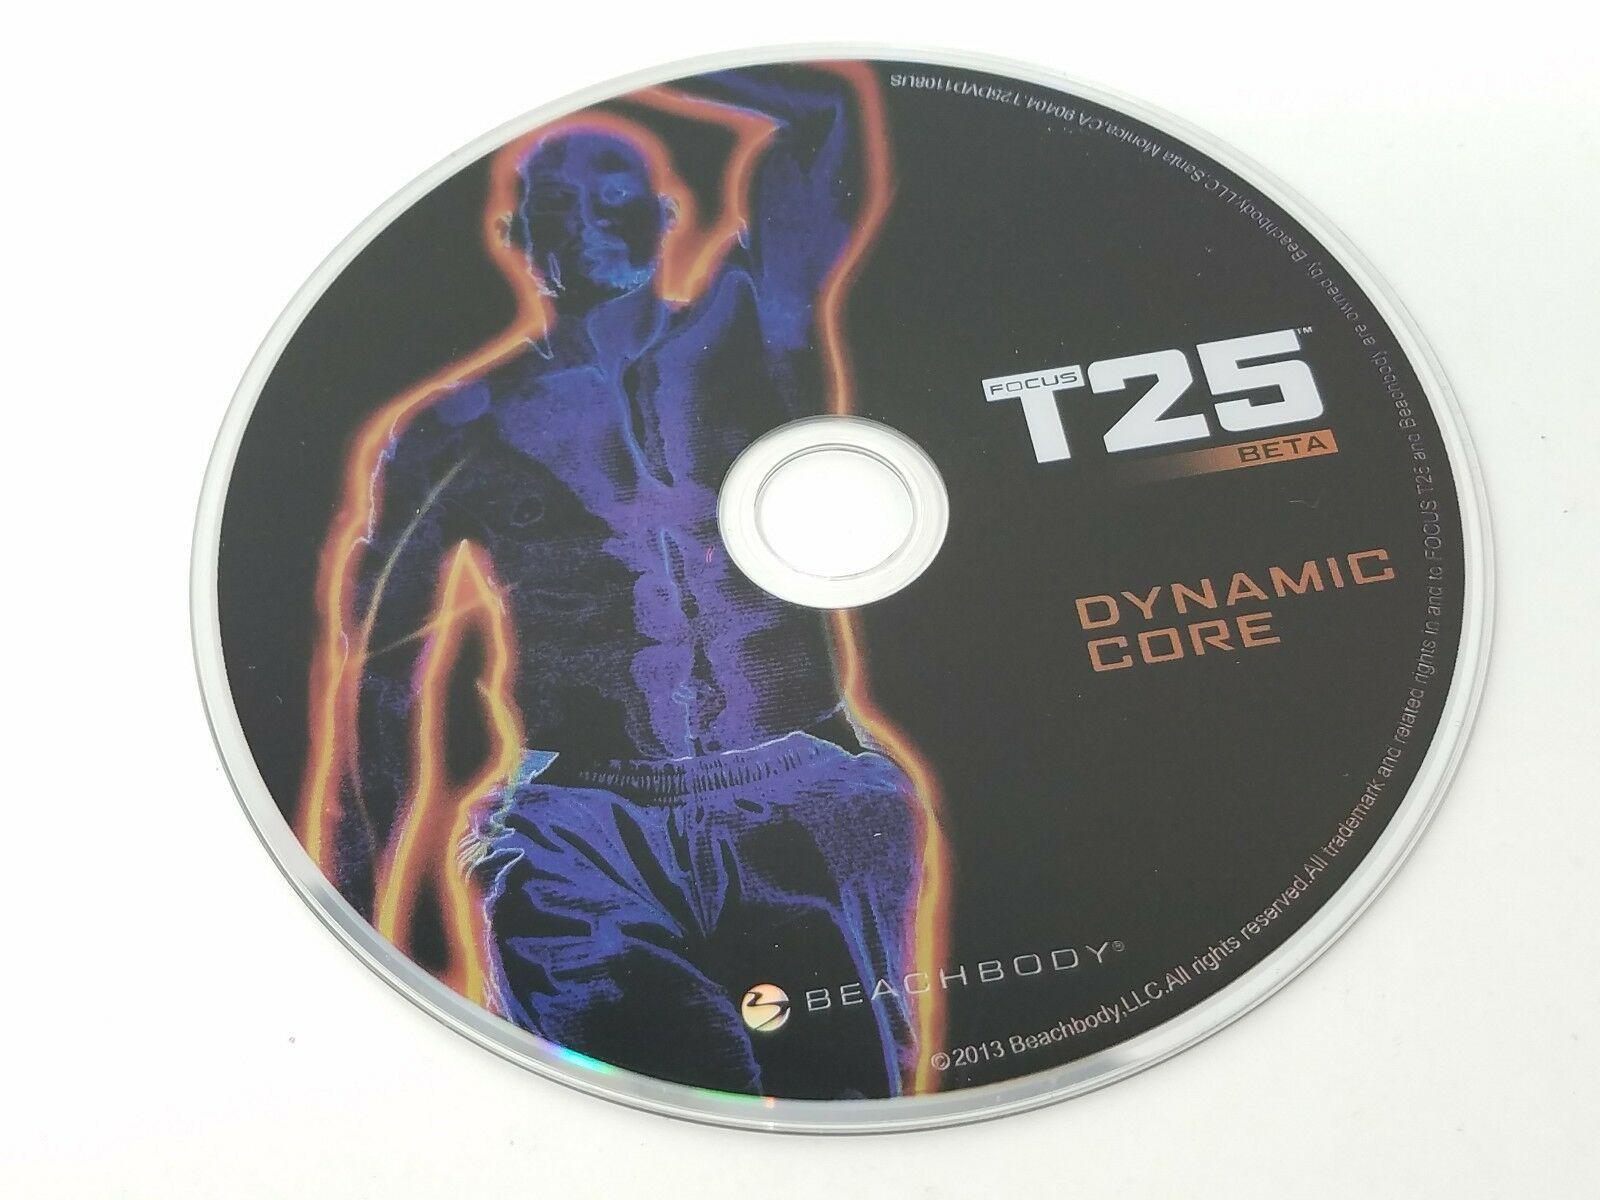 BeachBody Focus T25 Beta Dynamic Core Replacement Disc DVD Beach Body - G